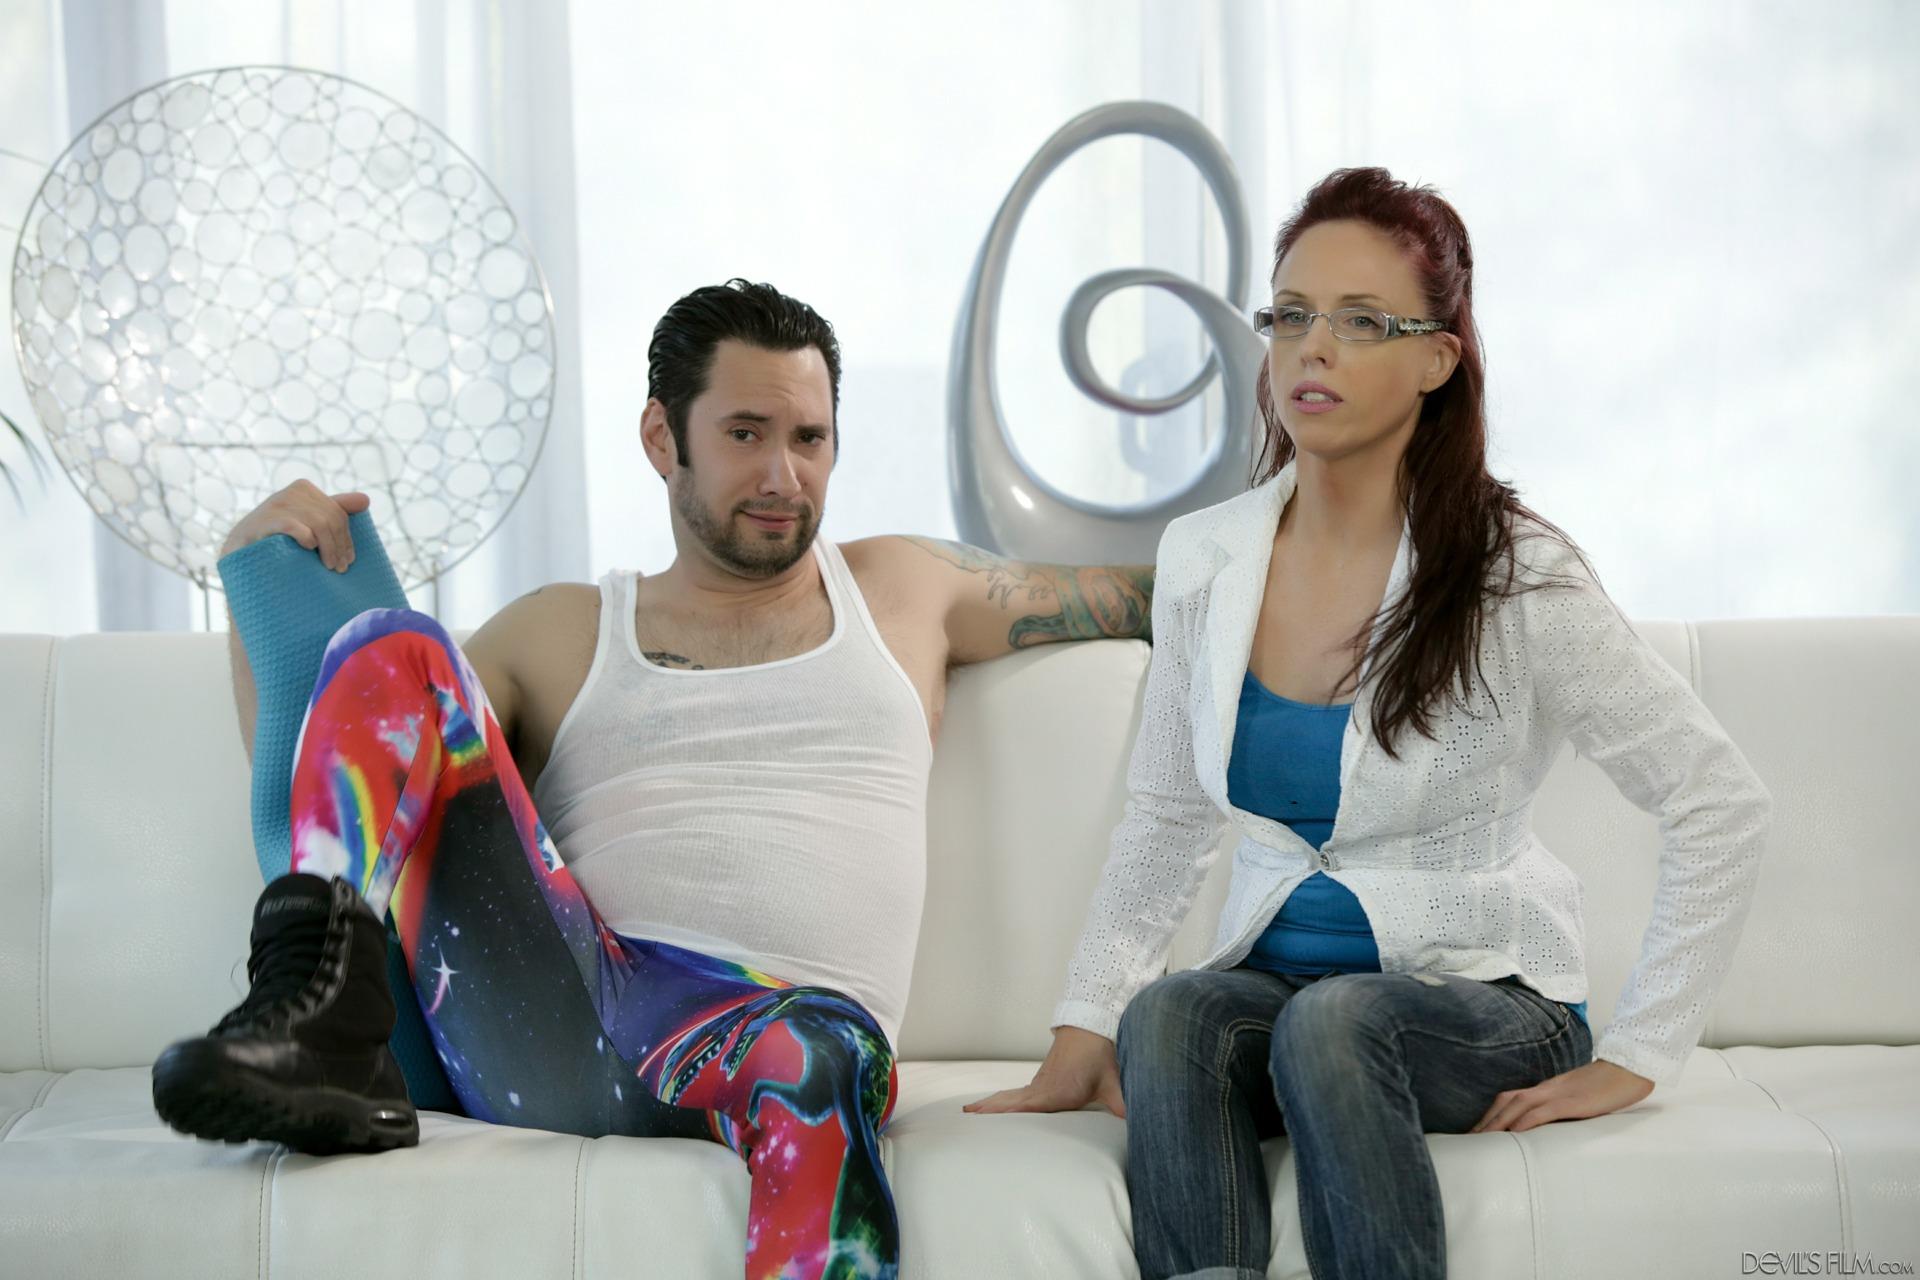 Top 10 ghetto anal porn movies